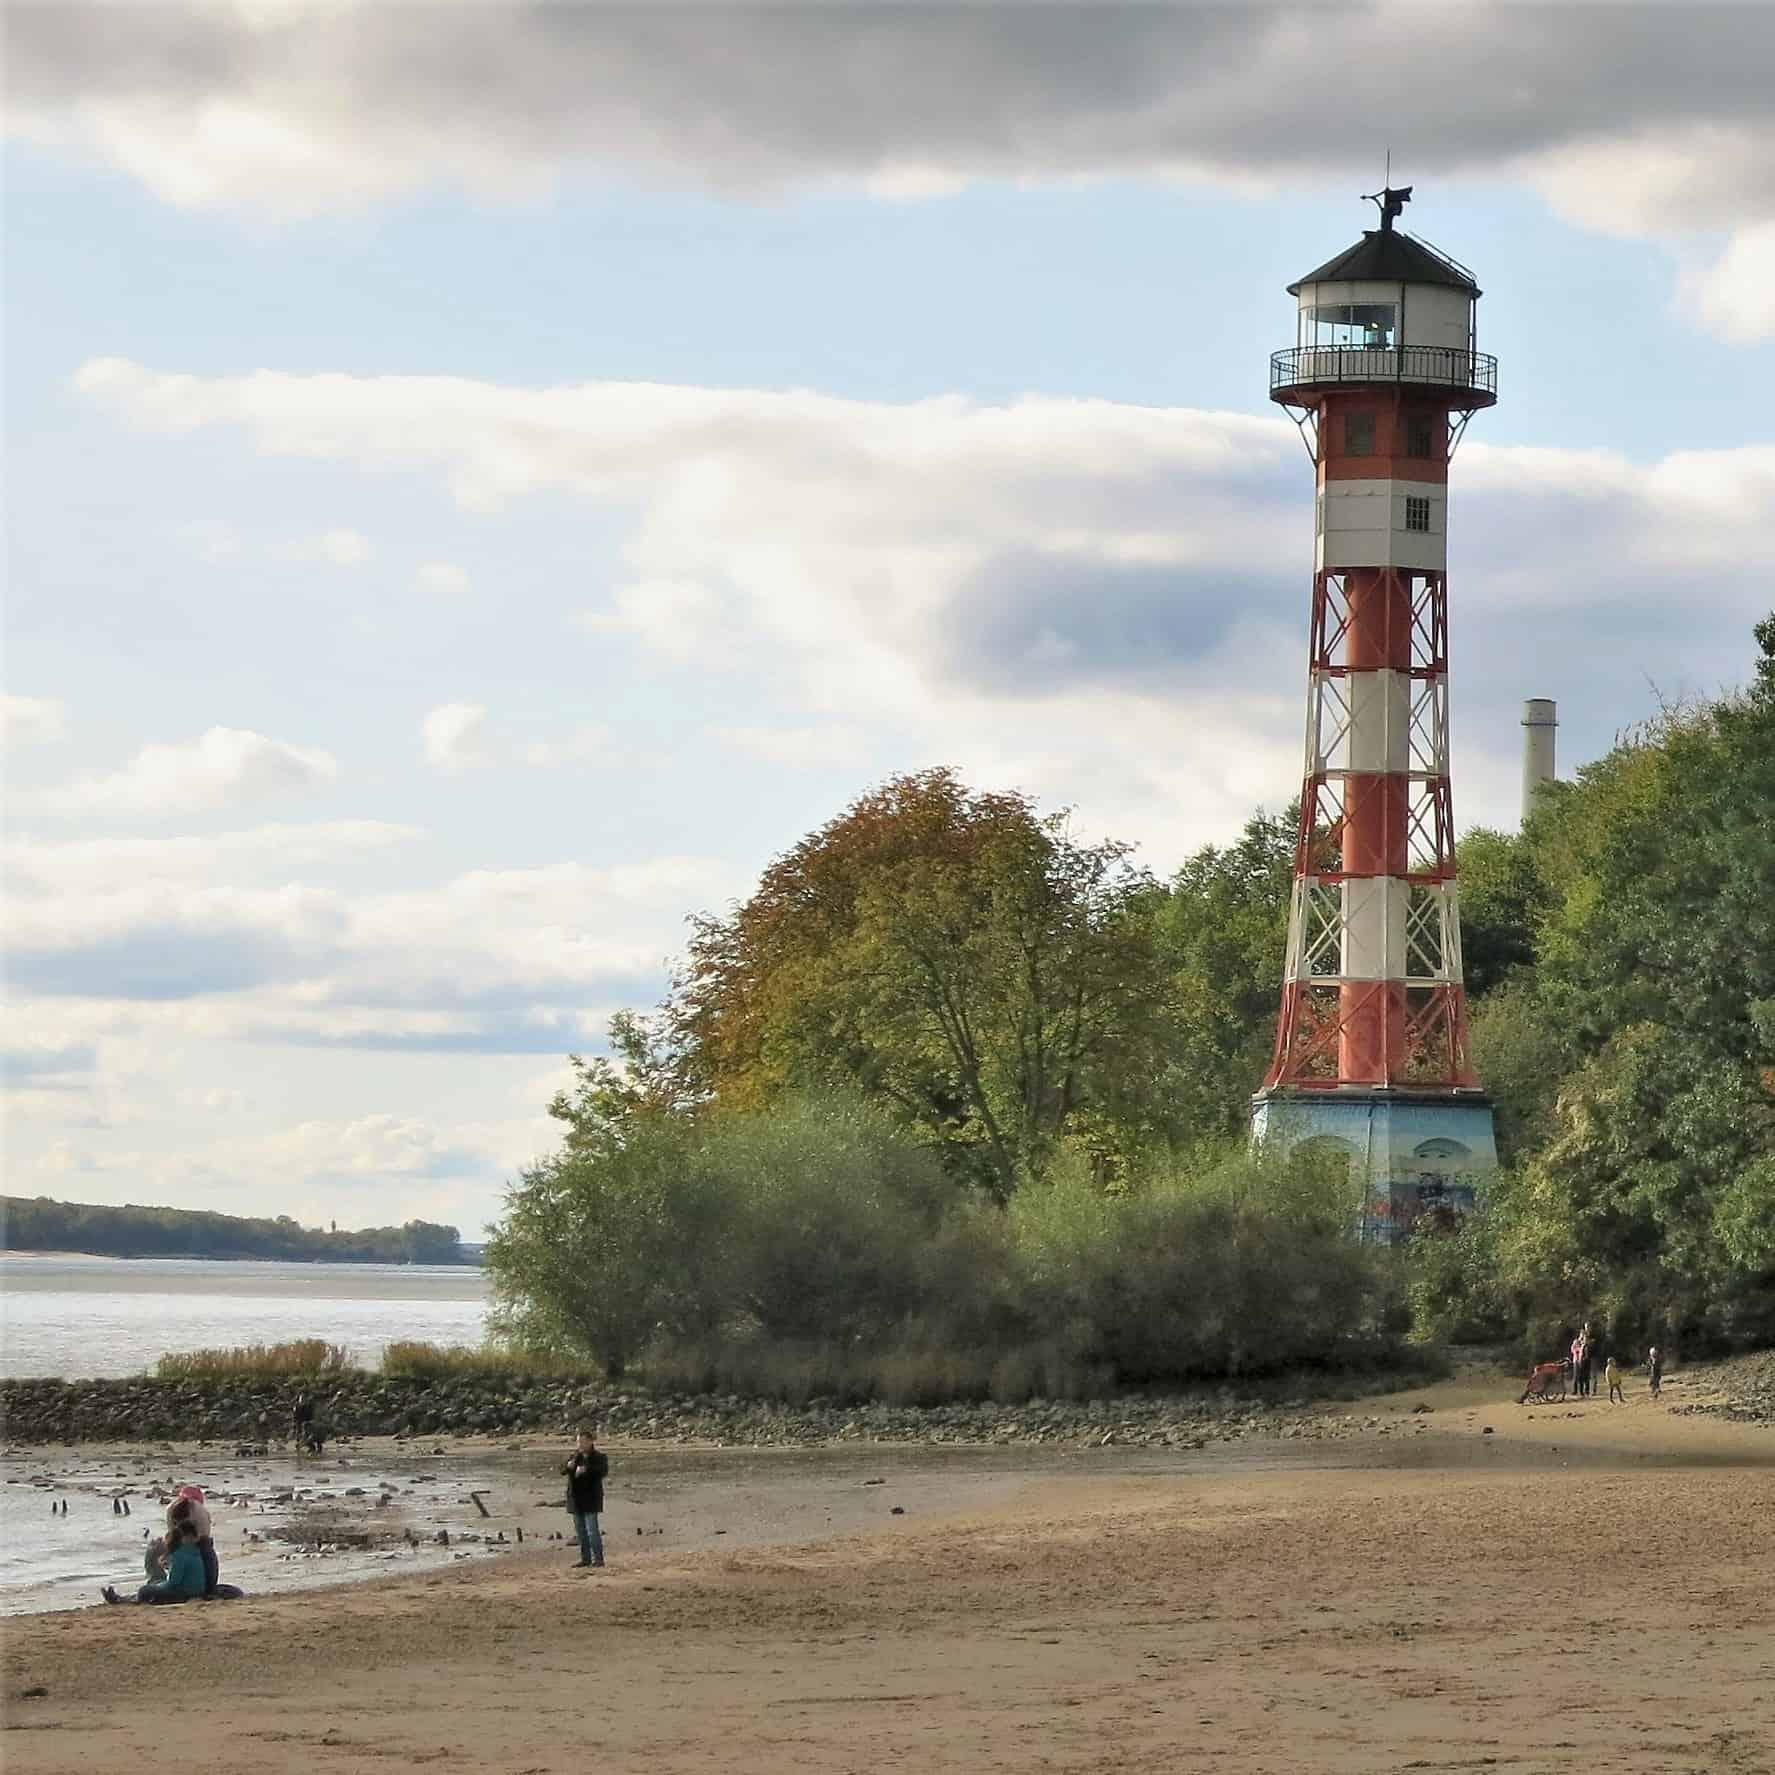 Falkenstein shore